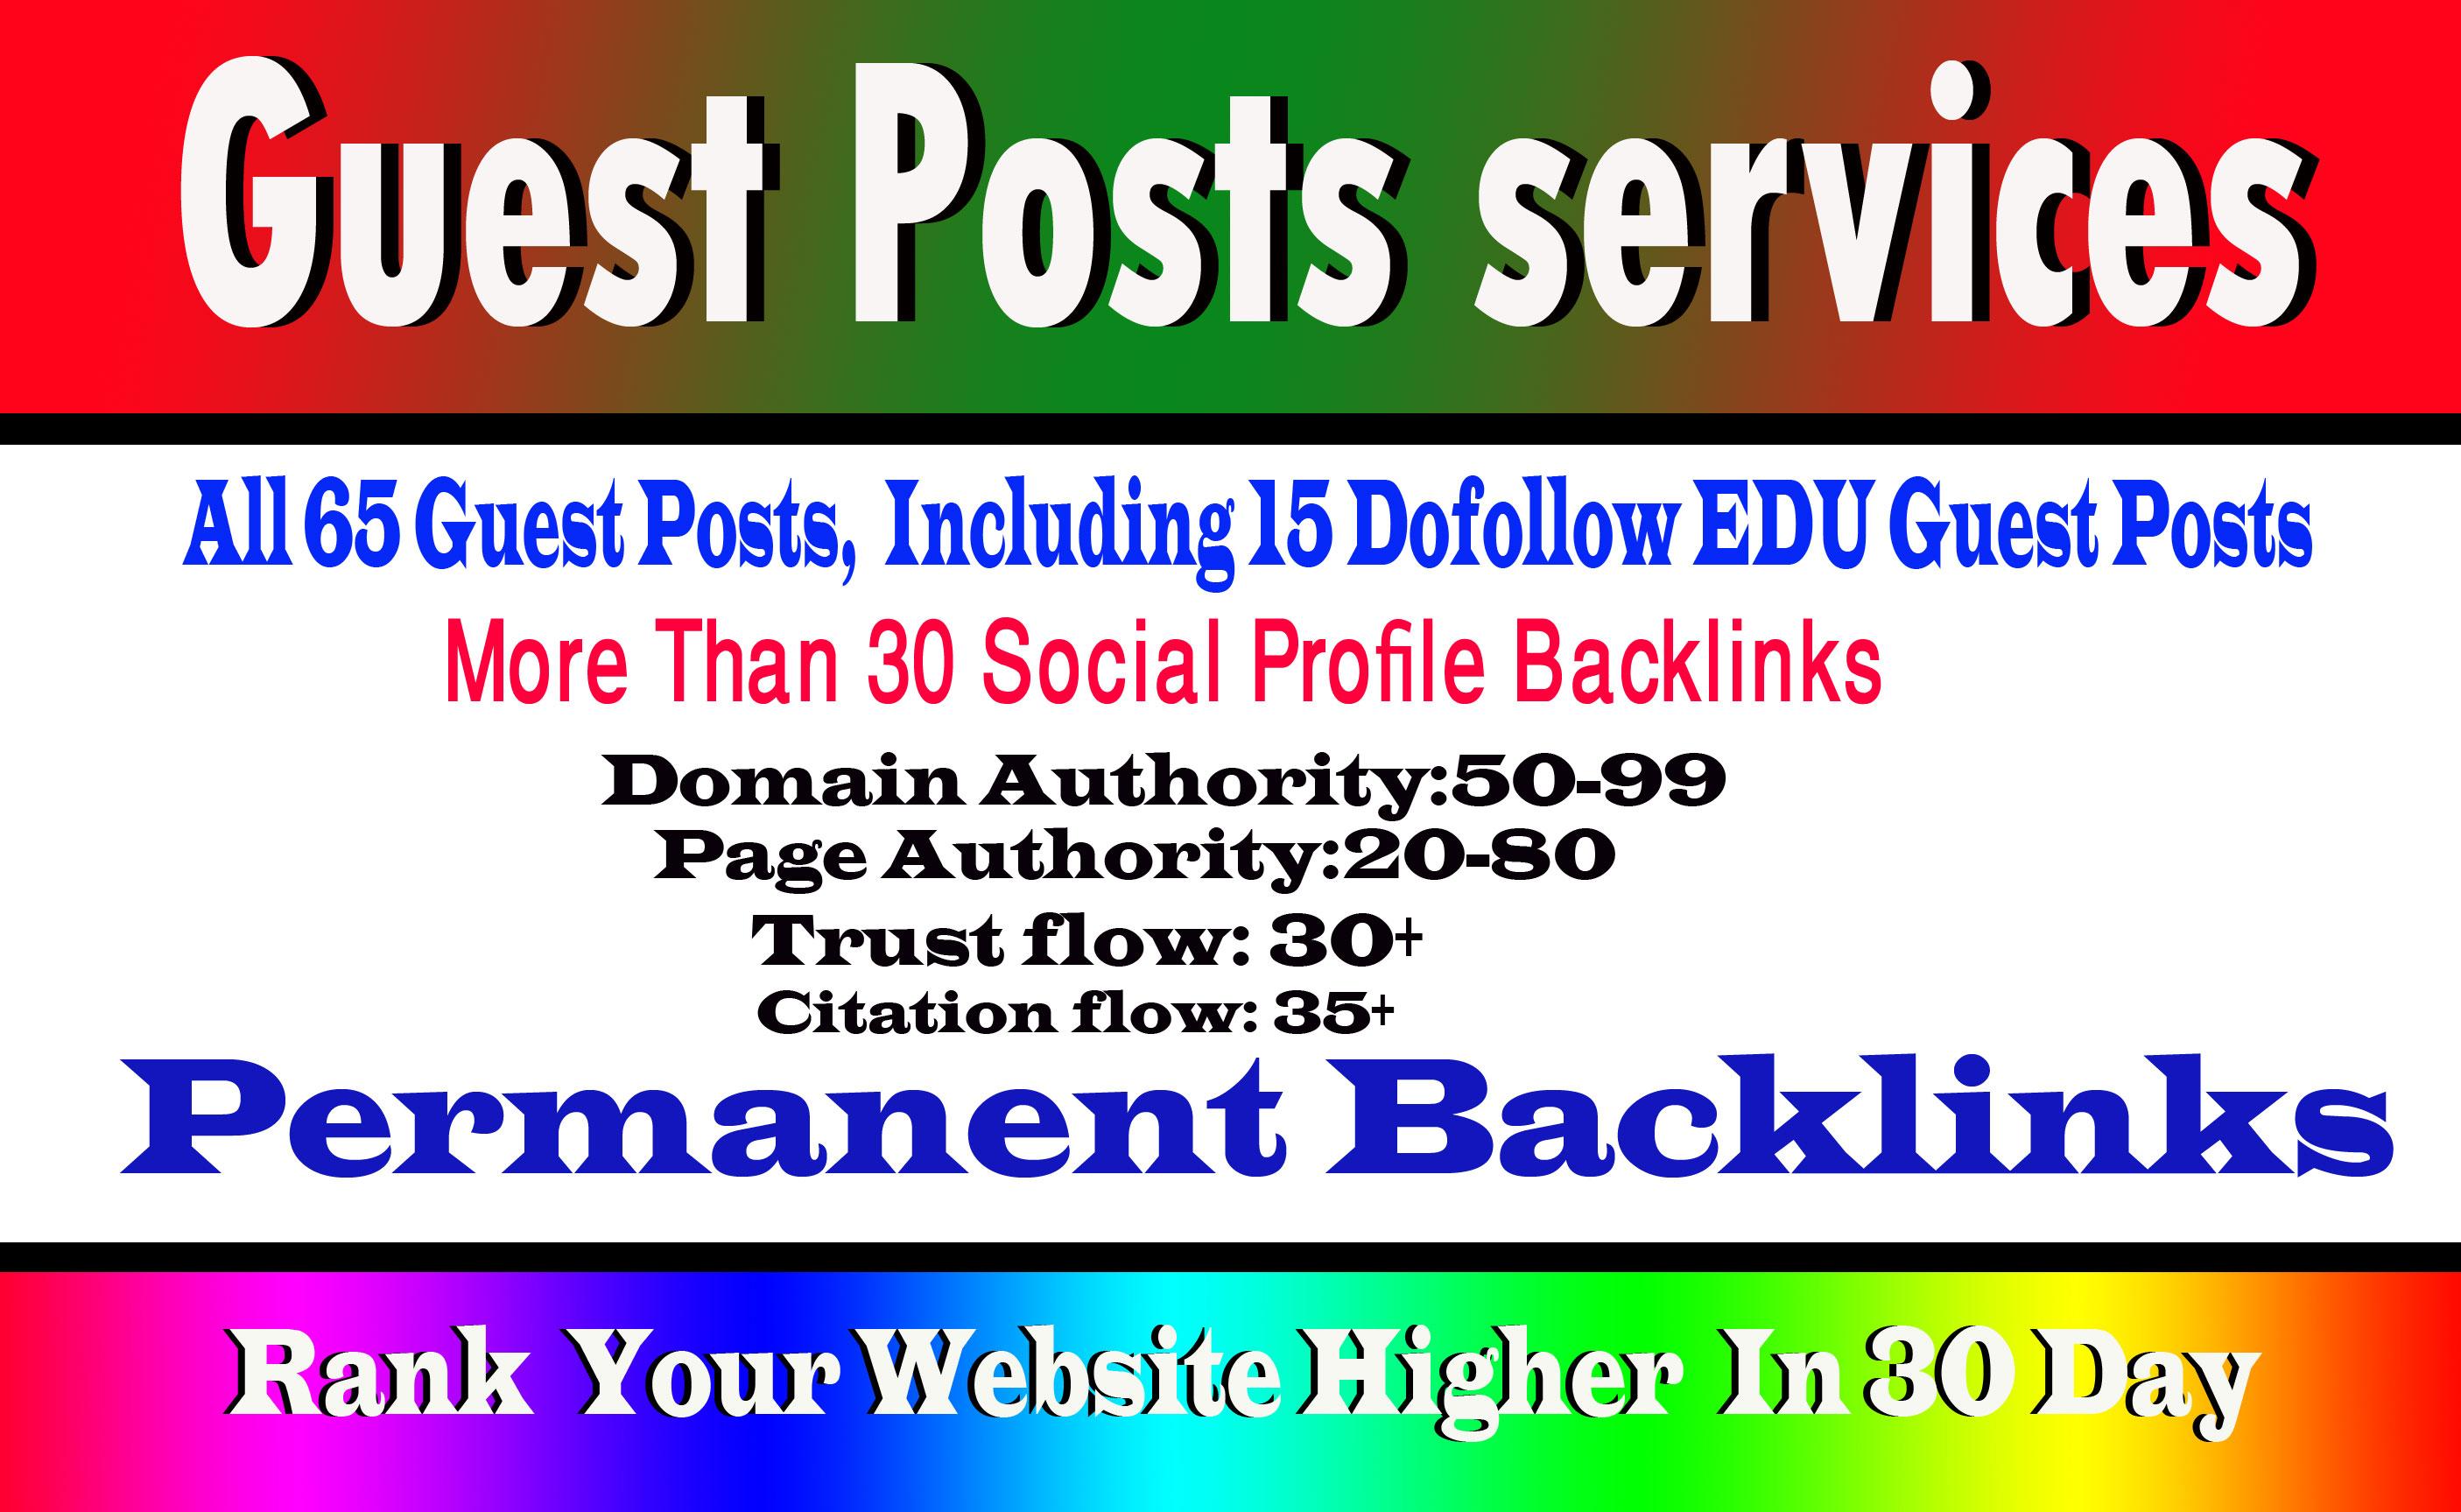 65 guest posts,  including 15 Edu guest post high Da sites and 30 more pr9 backlink